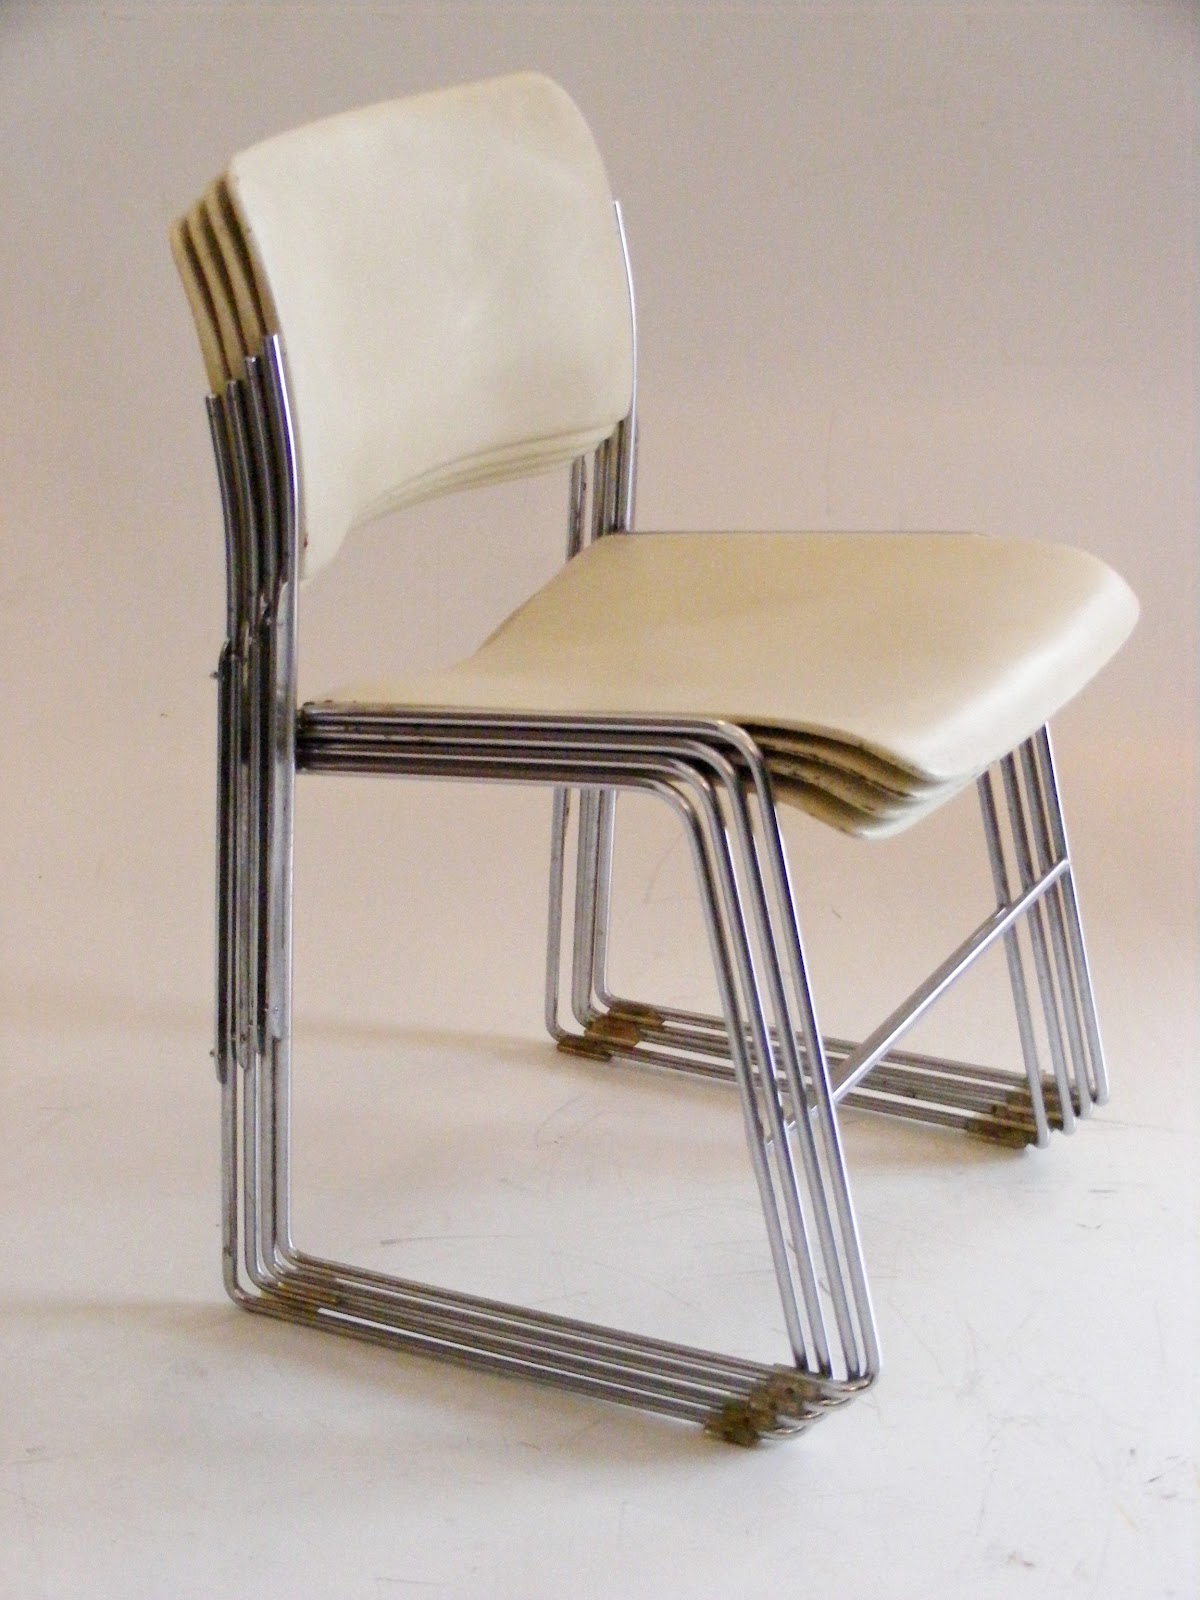 VAMP FURNITURE new vintage furniture stock at Vamp : PIC3AVAMP4XGHMETALCHAIRSR125000EACH04052012 from vampfurniture.blogspot.be size 1200 x 1600 jpeg 235kB